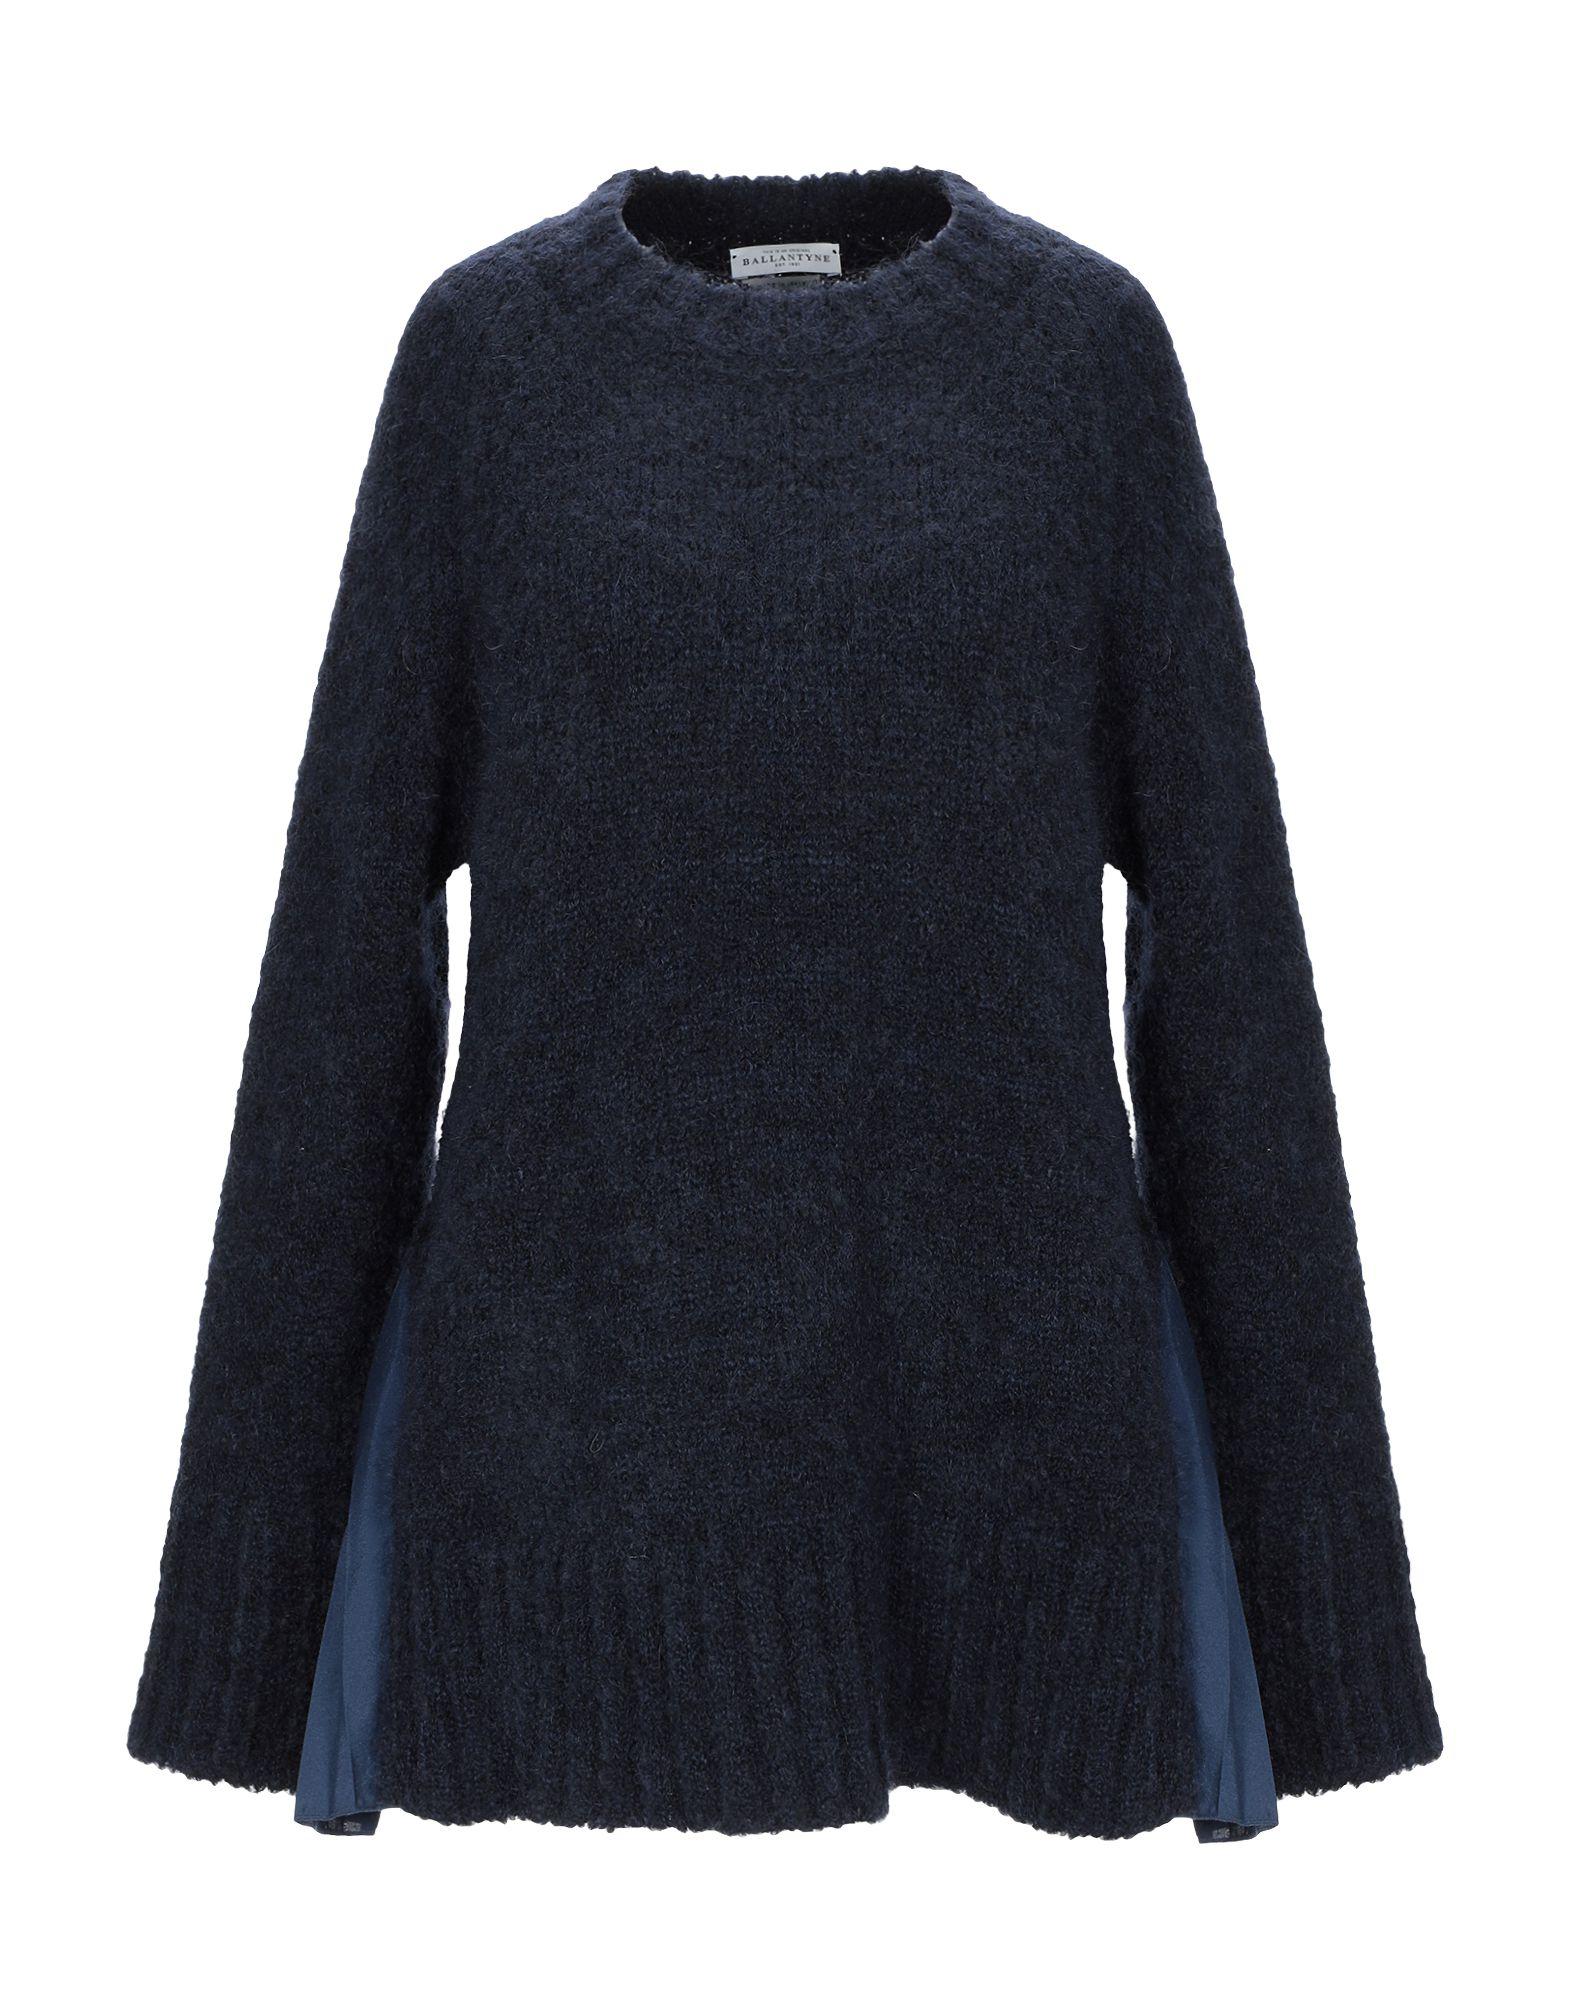 BALLANTYNE Sweaters - Item 39962831